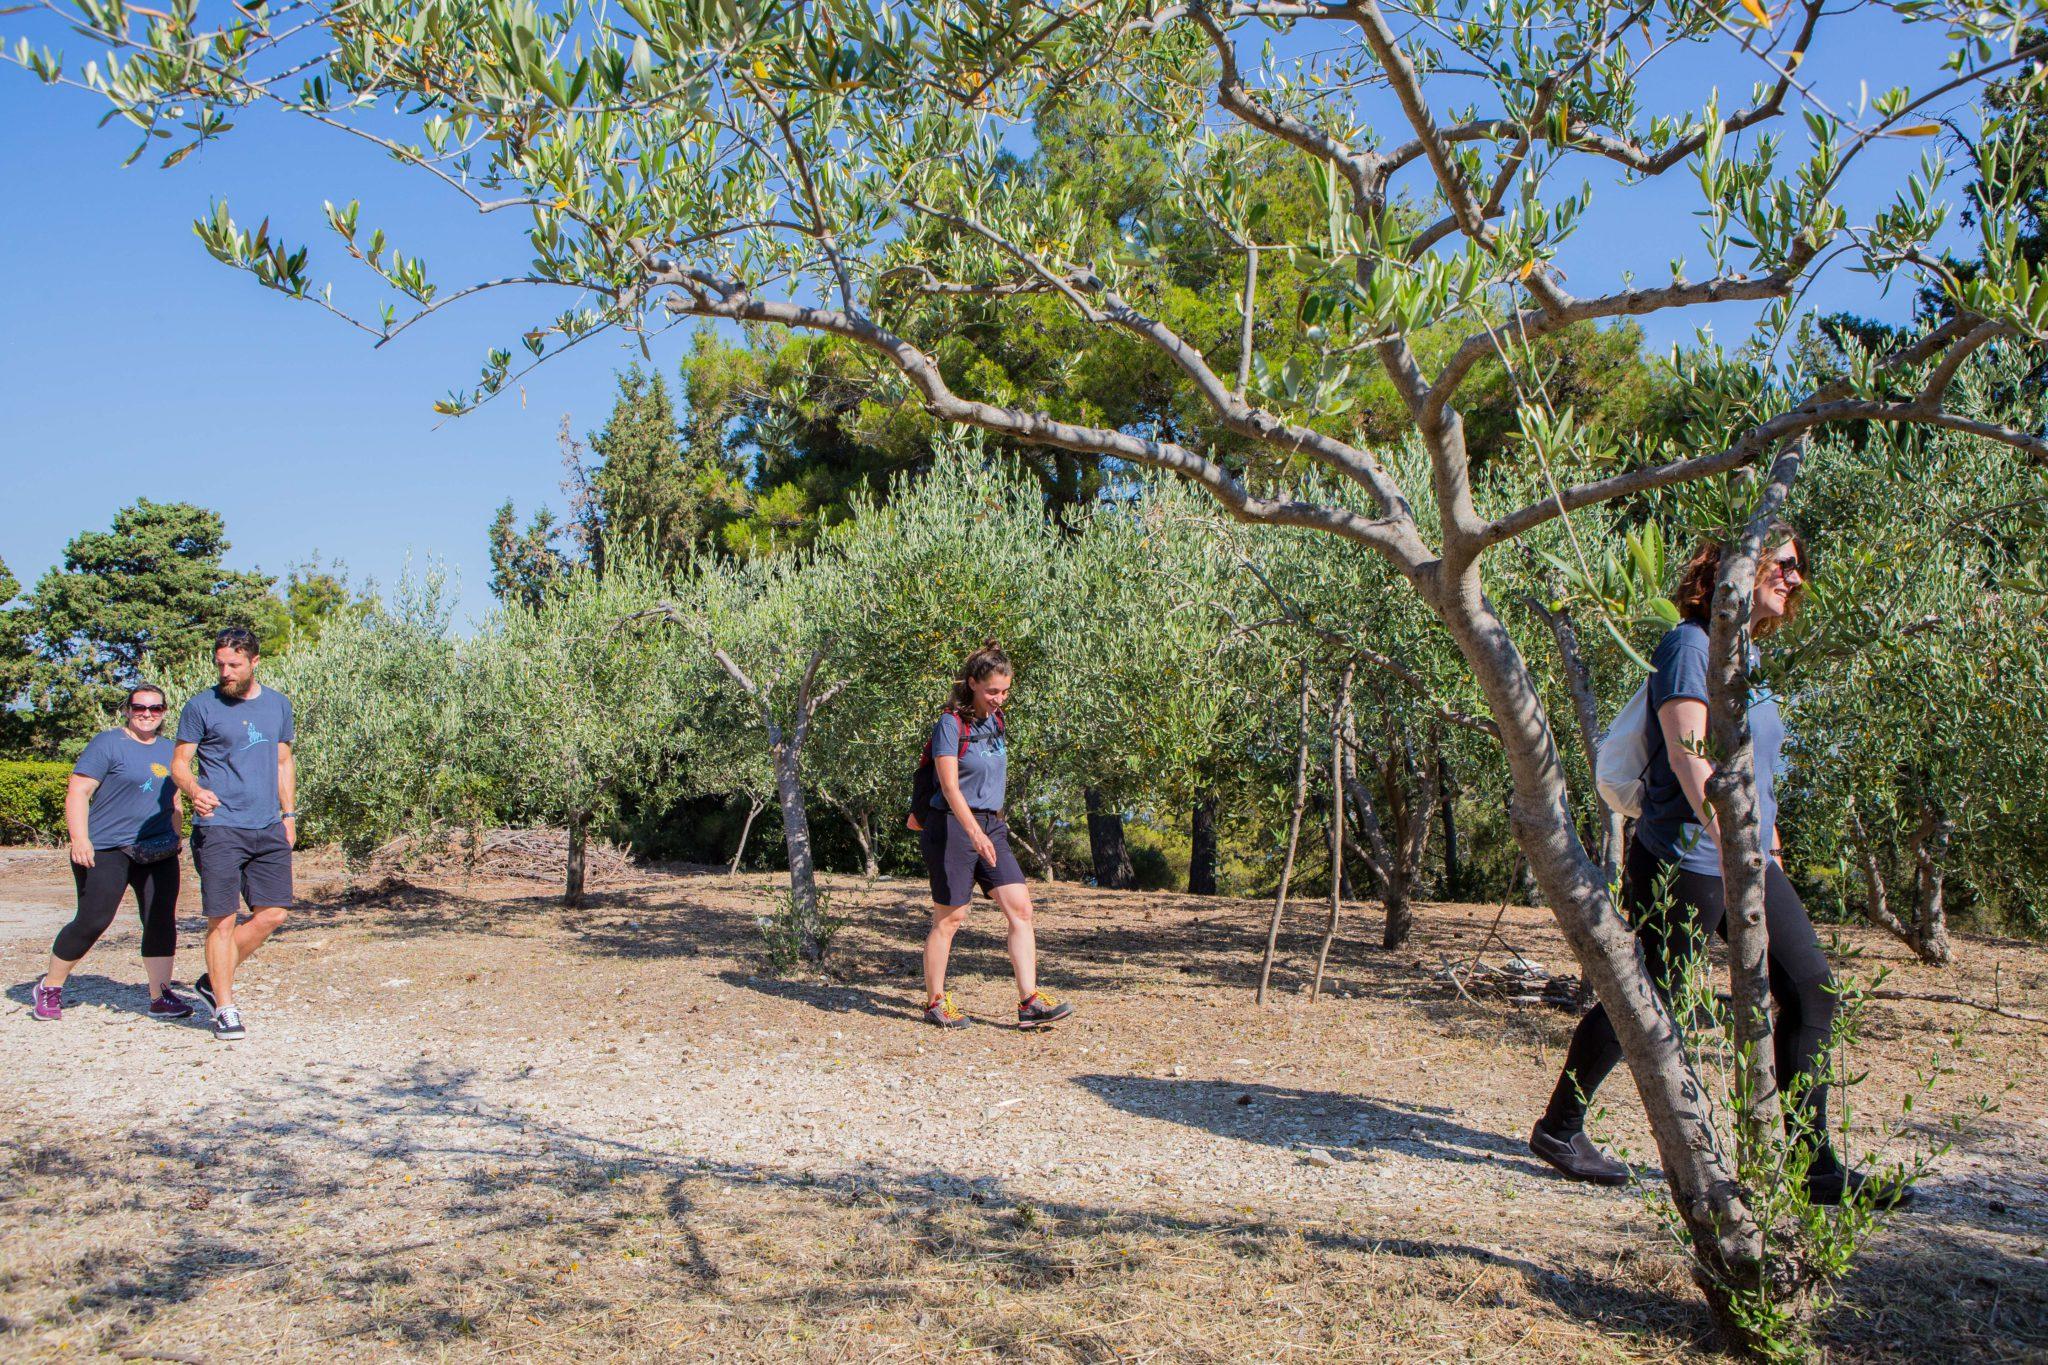 7 Day Walk and hike from Split to Dubrovnik: Hiking in Croatia